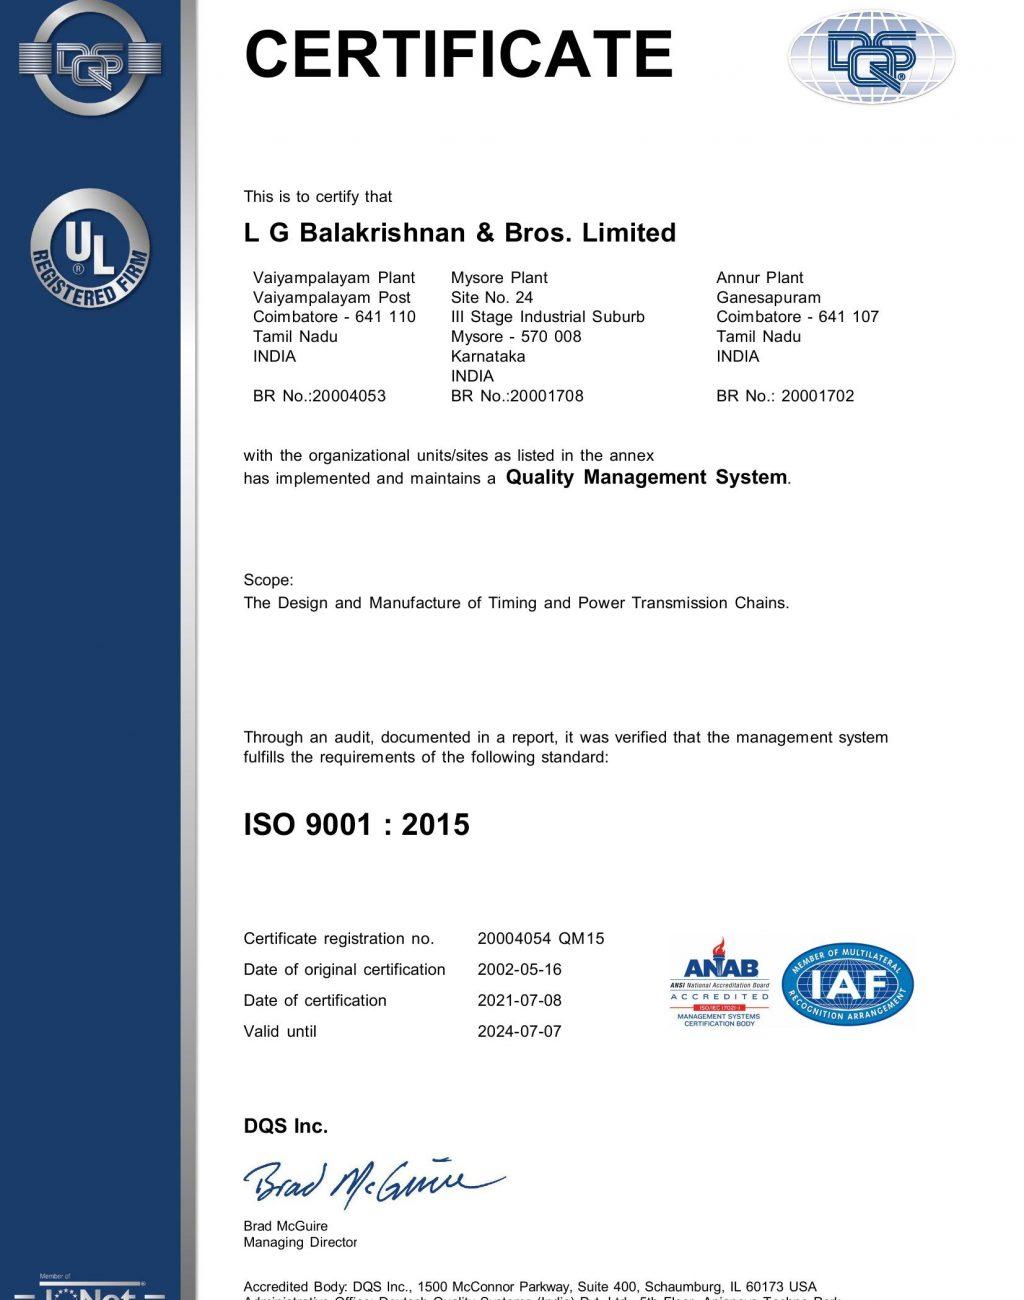 LGB Corporate ISO 9001 2015